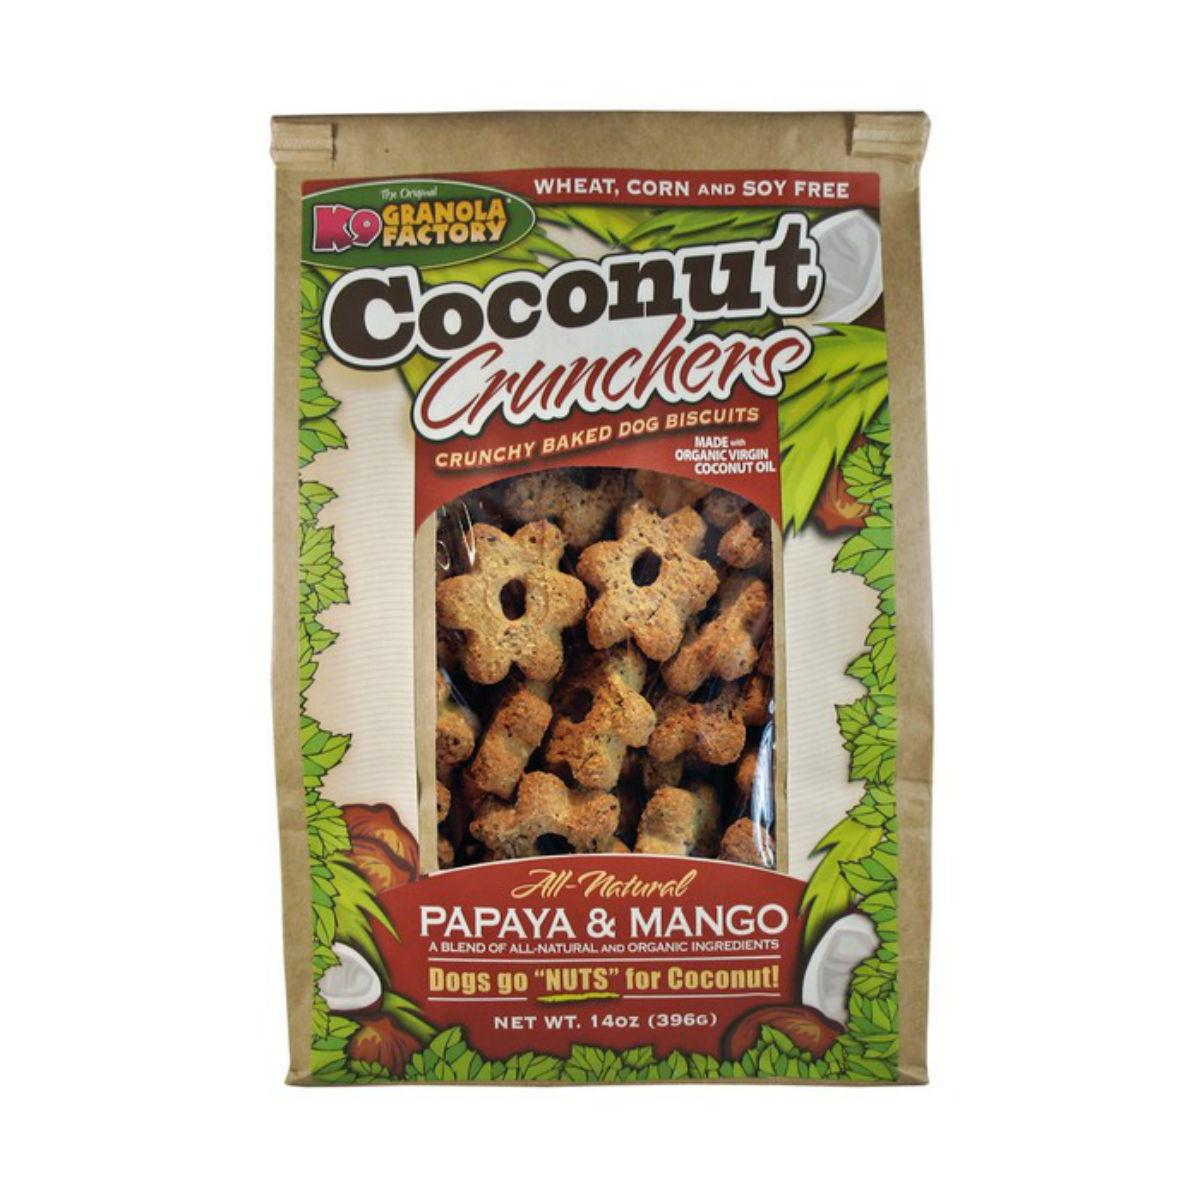 K9 Granola Factory Coconut Crunchers Dog Treat - Papaya & Mango